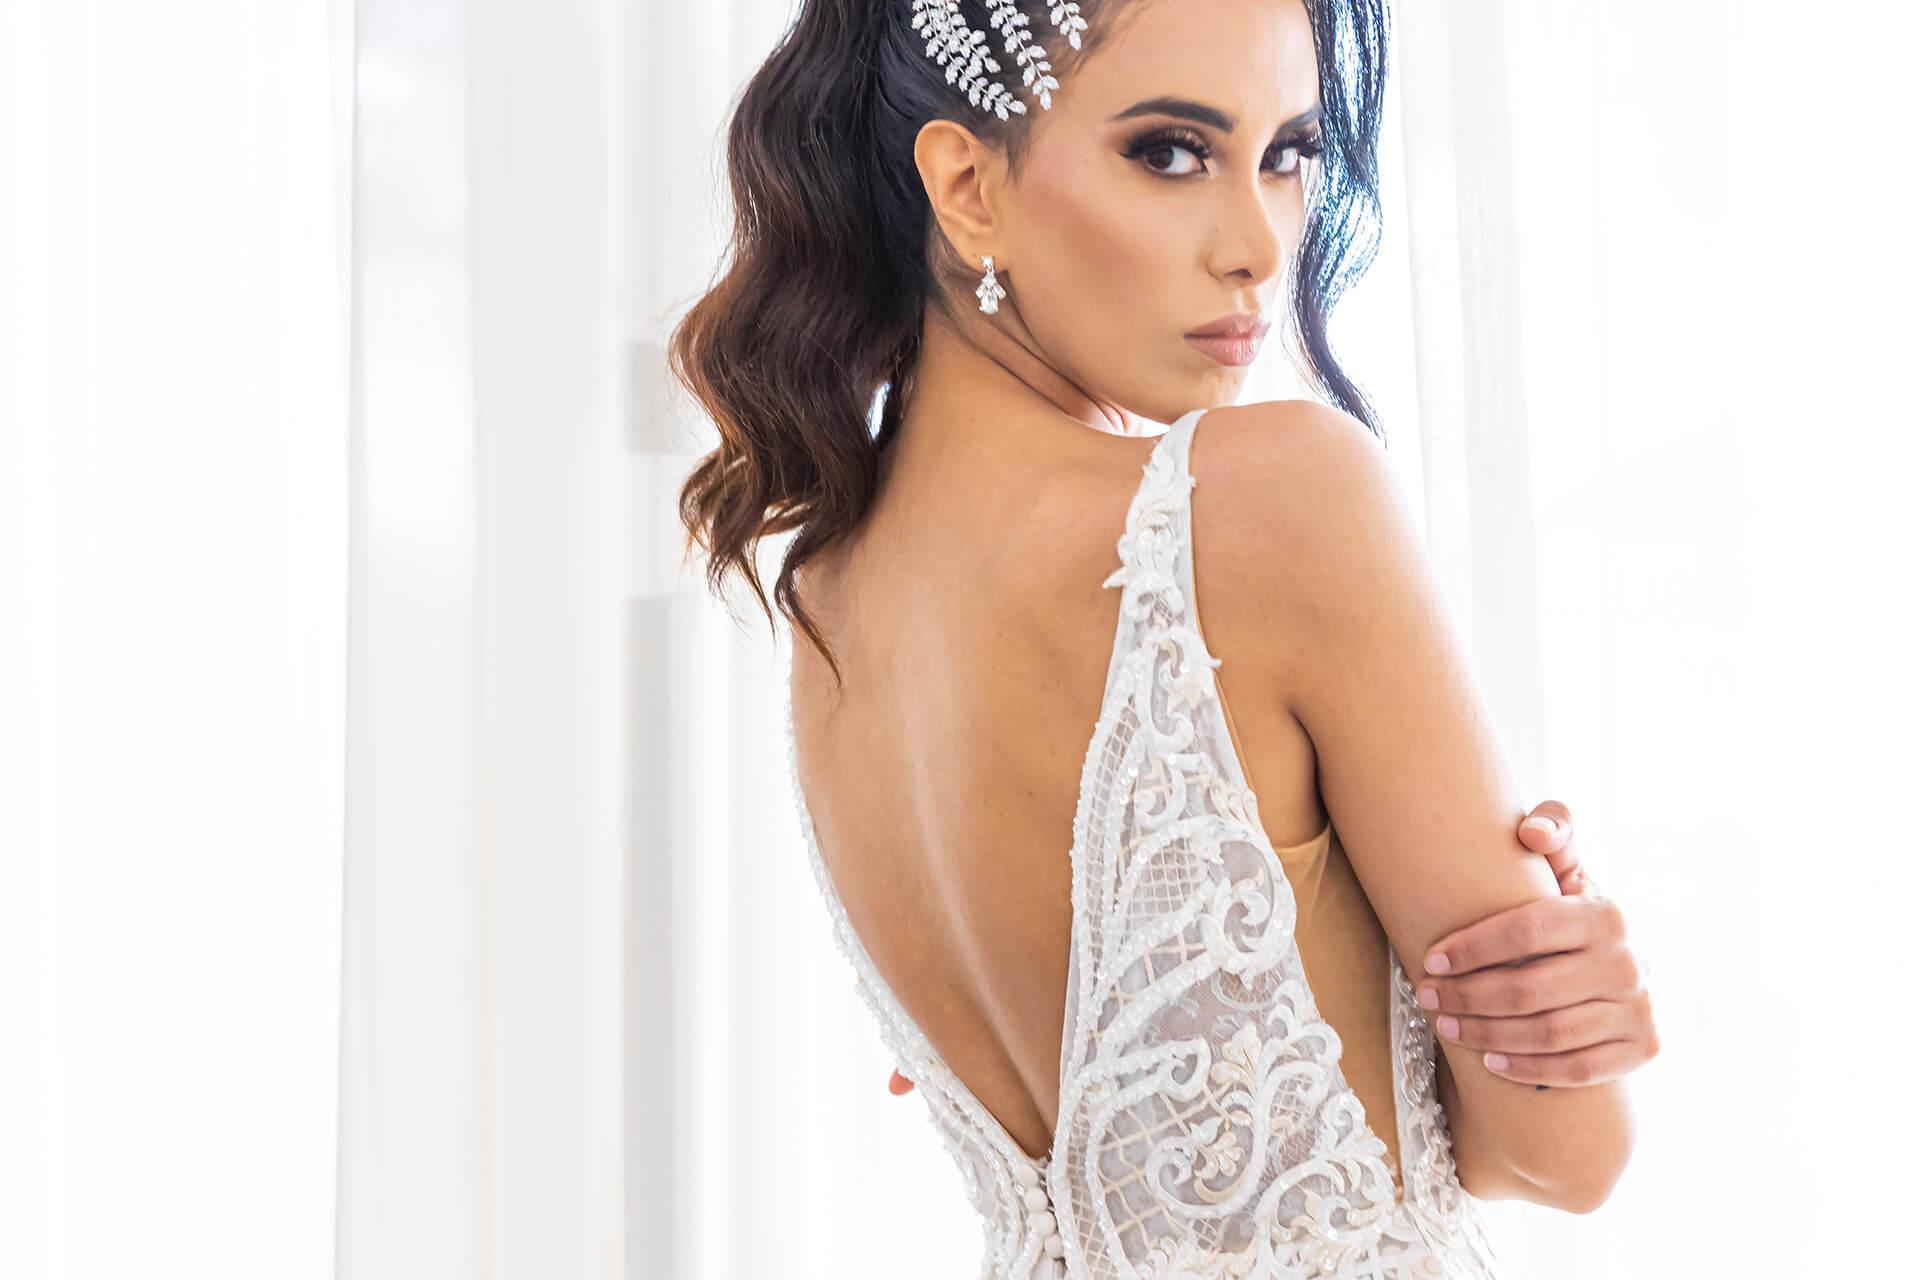 Model in a wedding dress looking over her shoulder